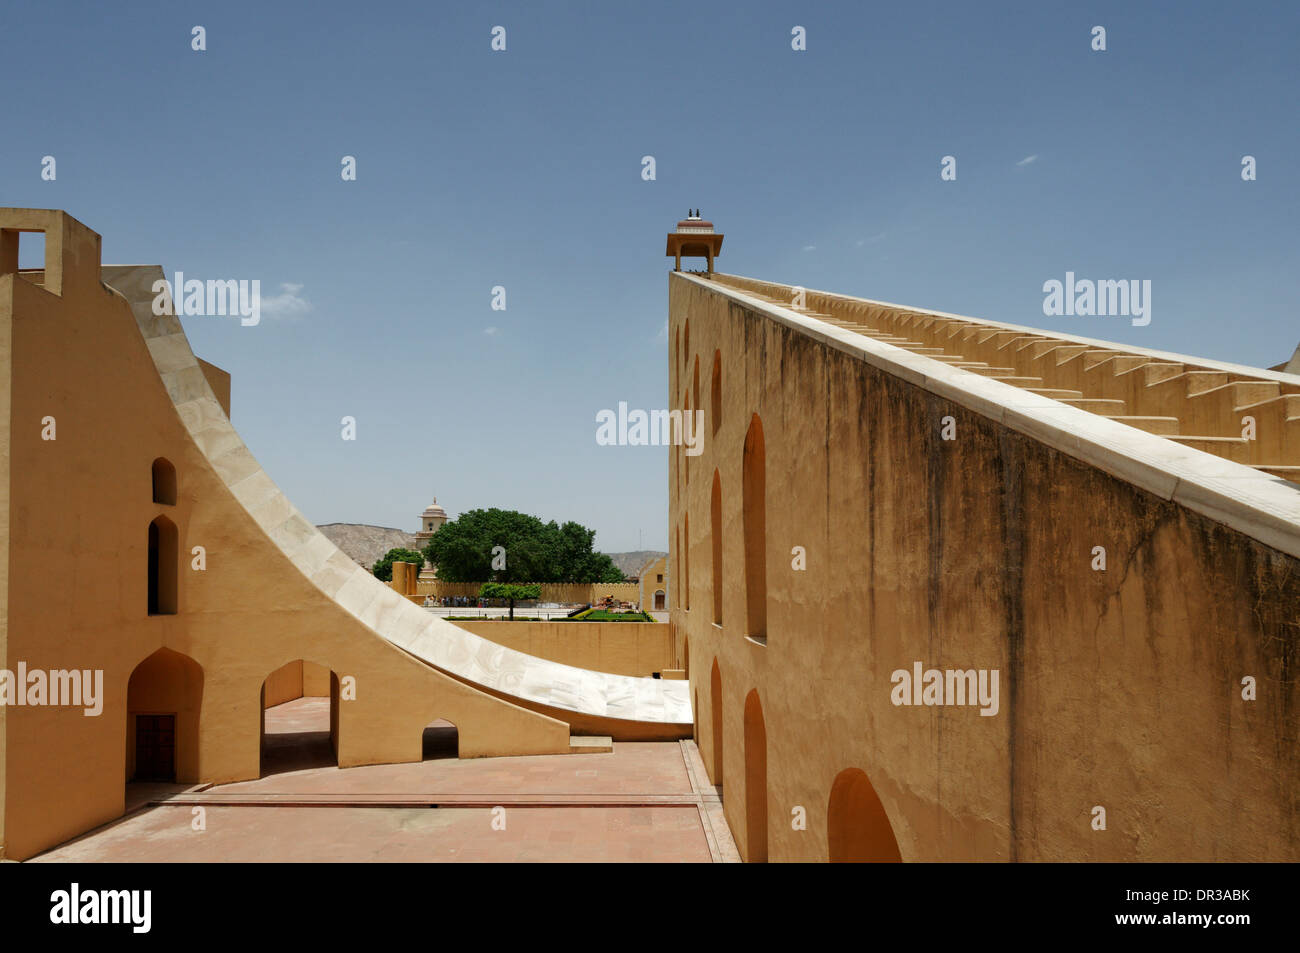 Il Jantar Mantar osservatorio astronomico di Jaipur, Rajasthan, India Immagini Stock